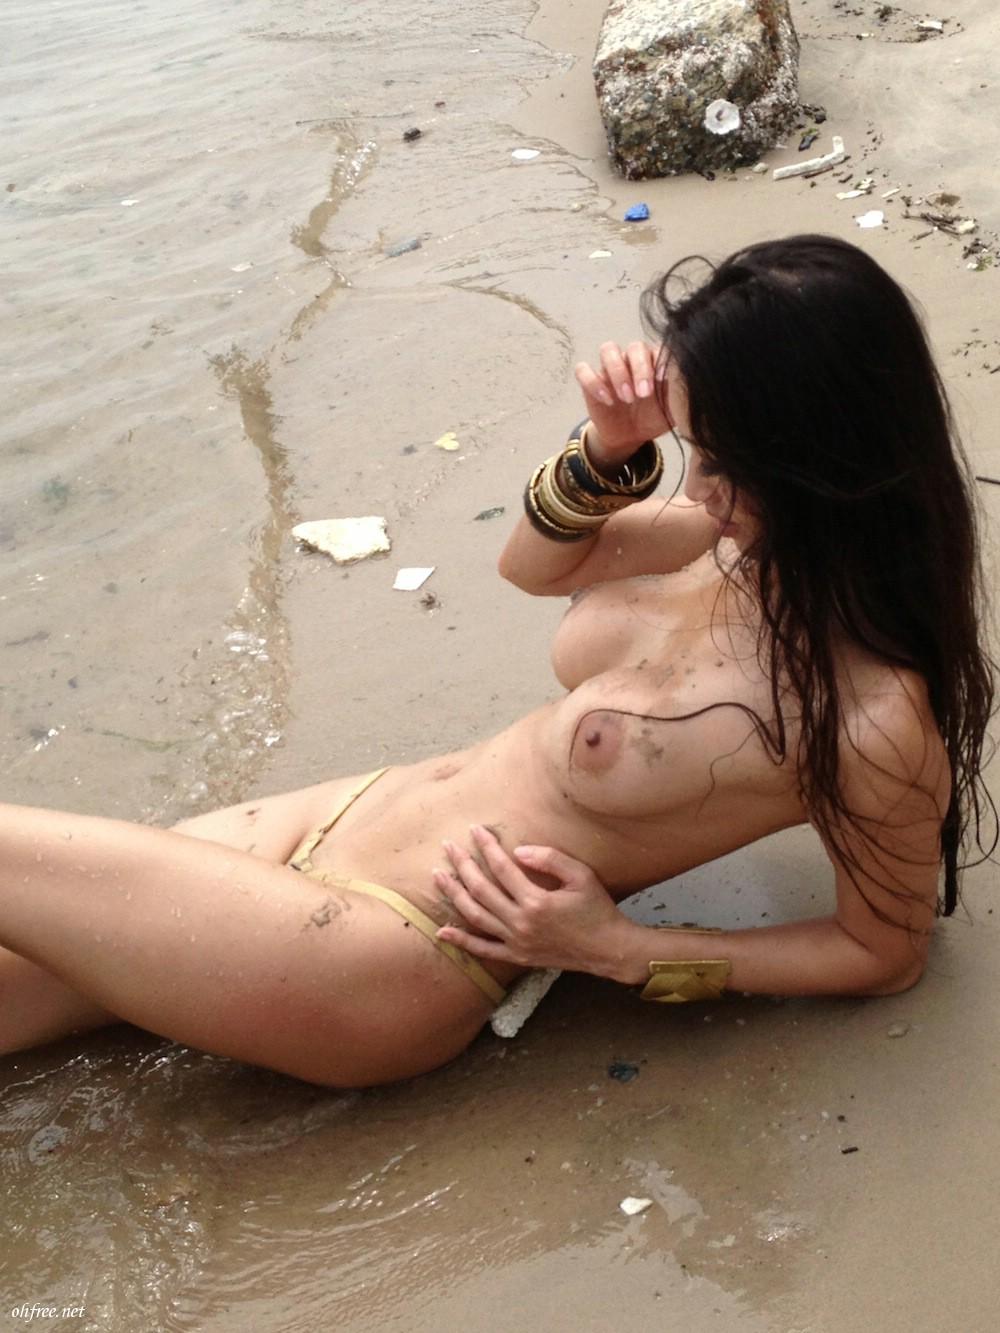 DJ-Angie-Vu-Ha-Naked-Photos-www-ohfree-net-076